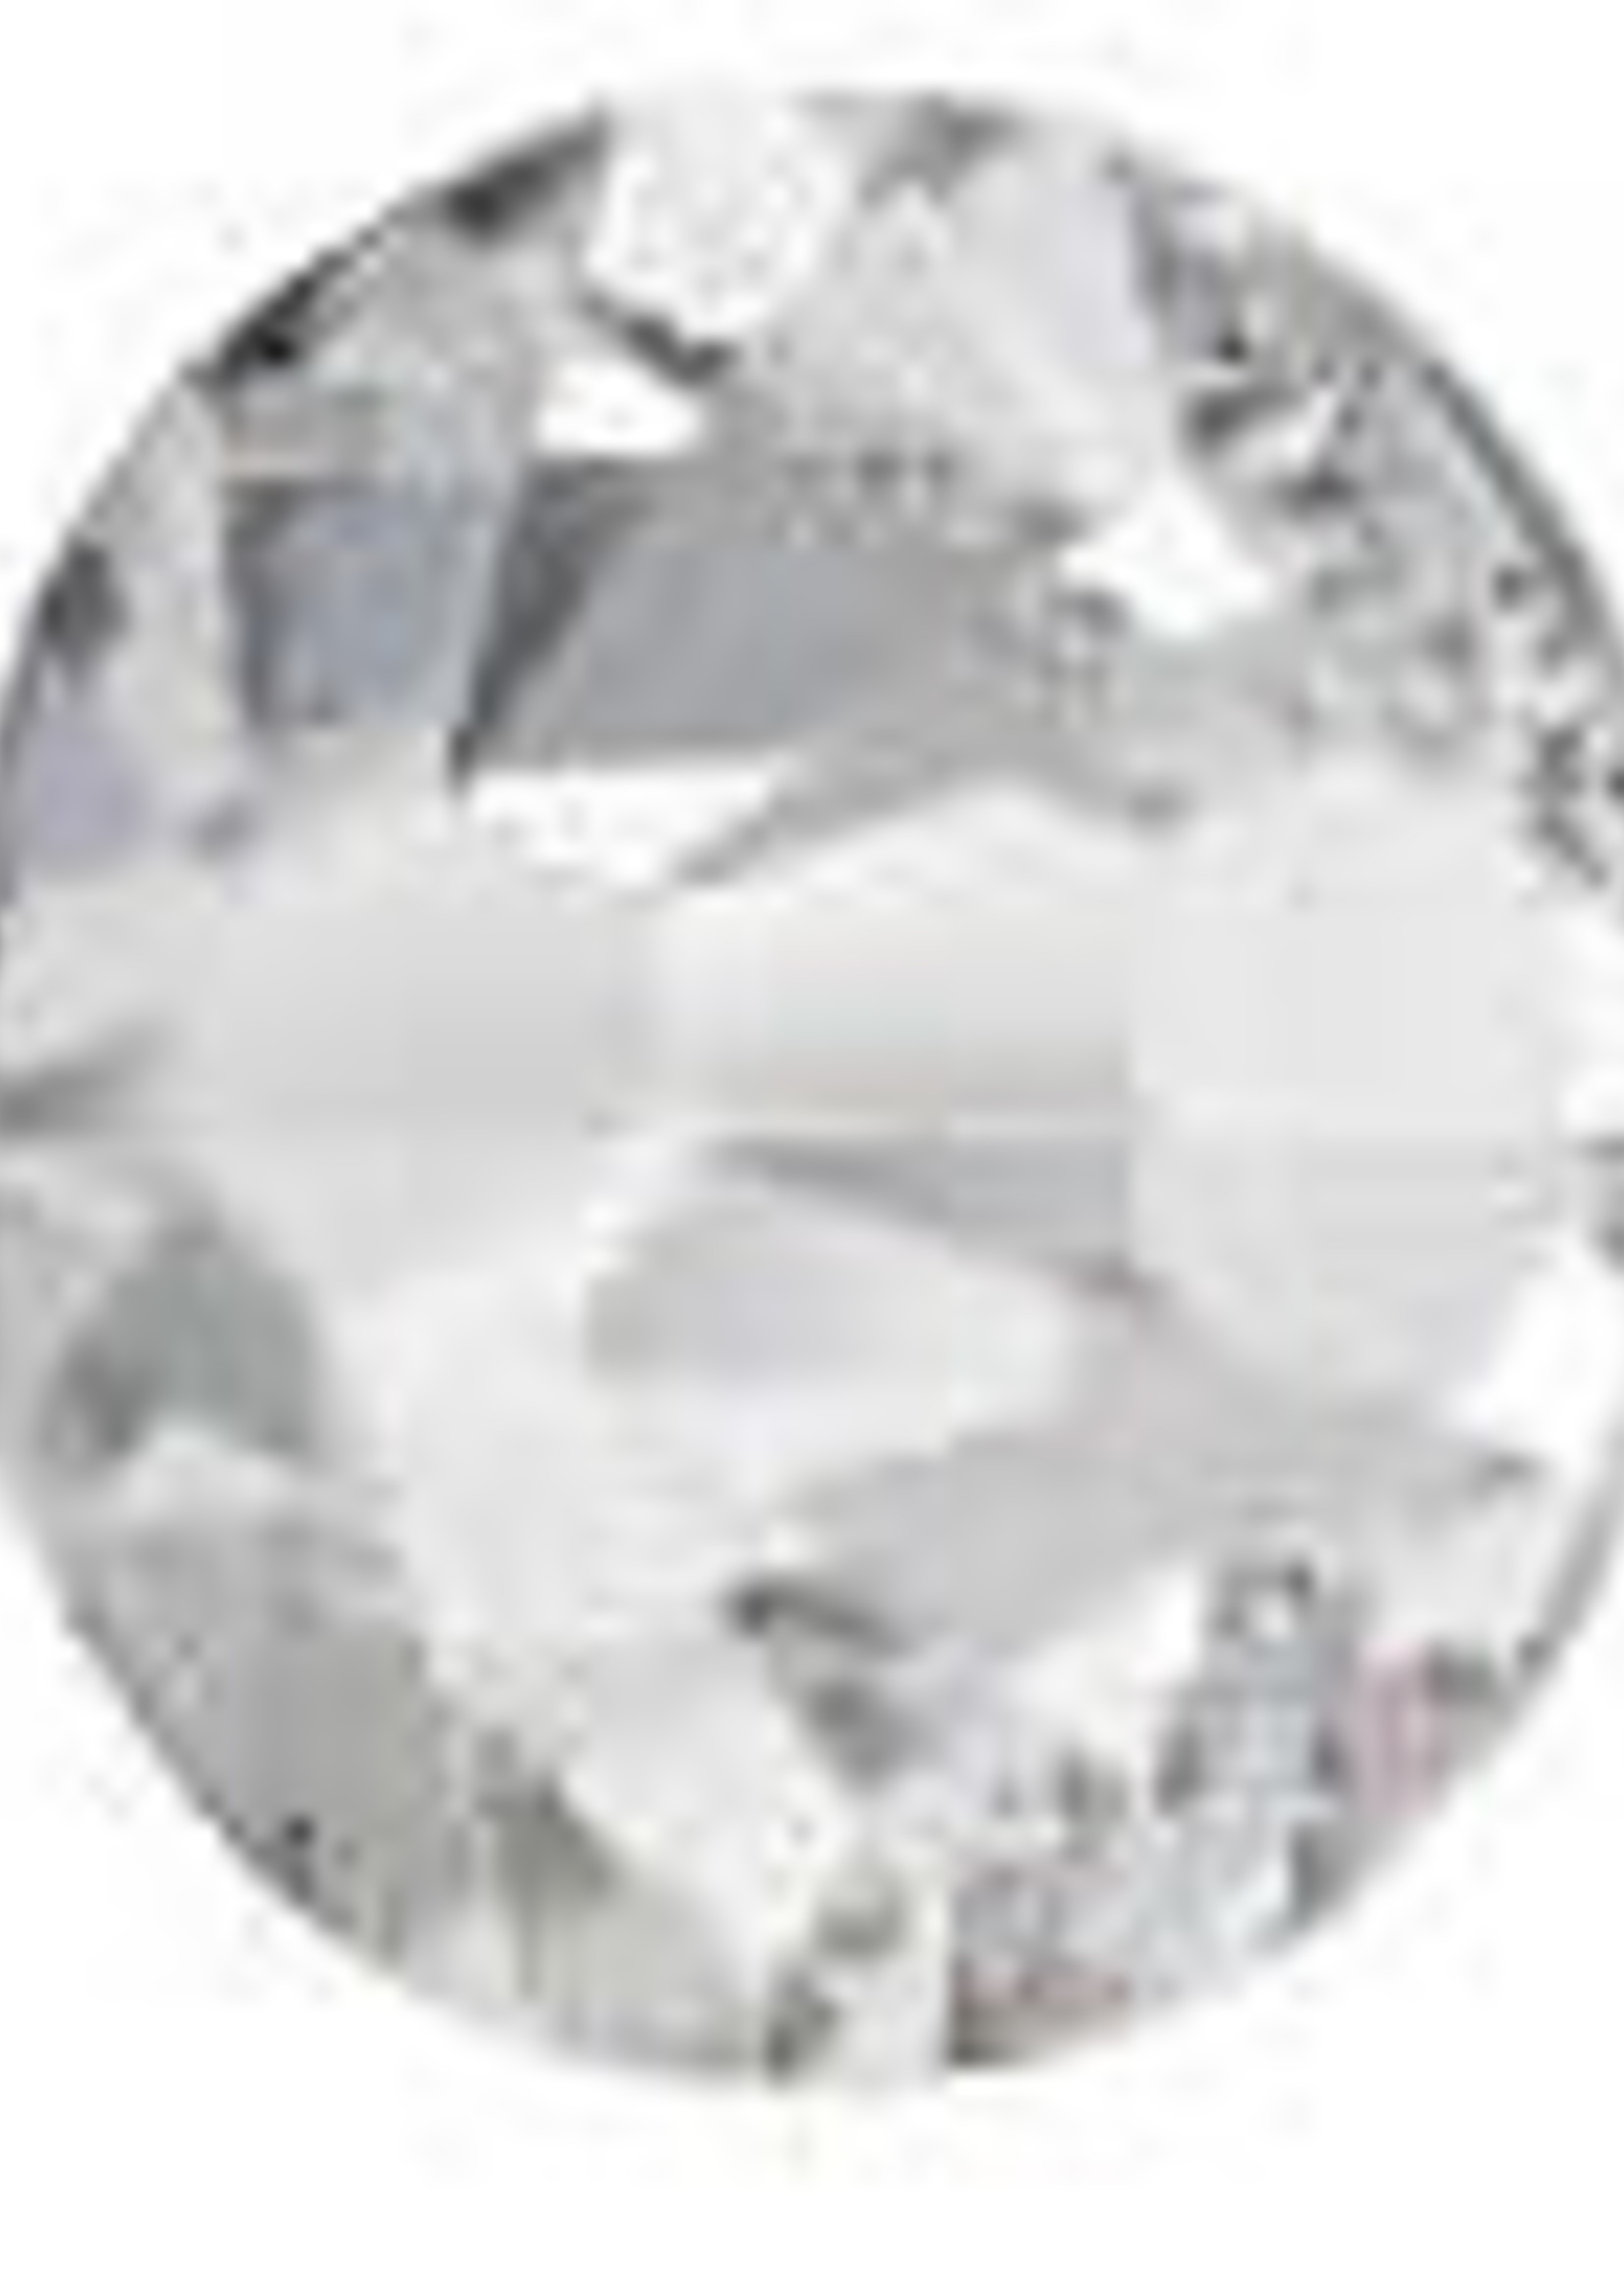 Swarovski Swarovski Crystal Silver 1.75 mm